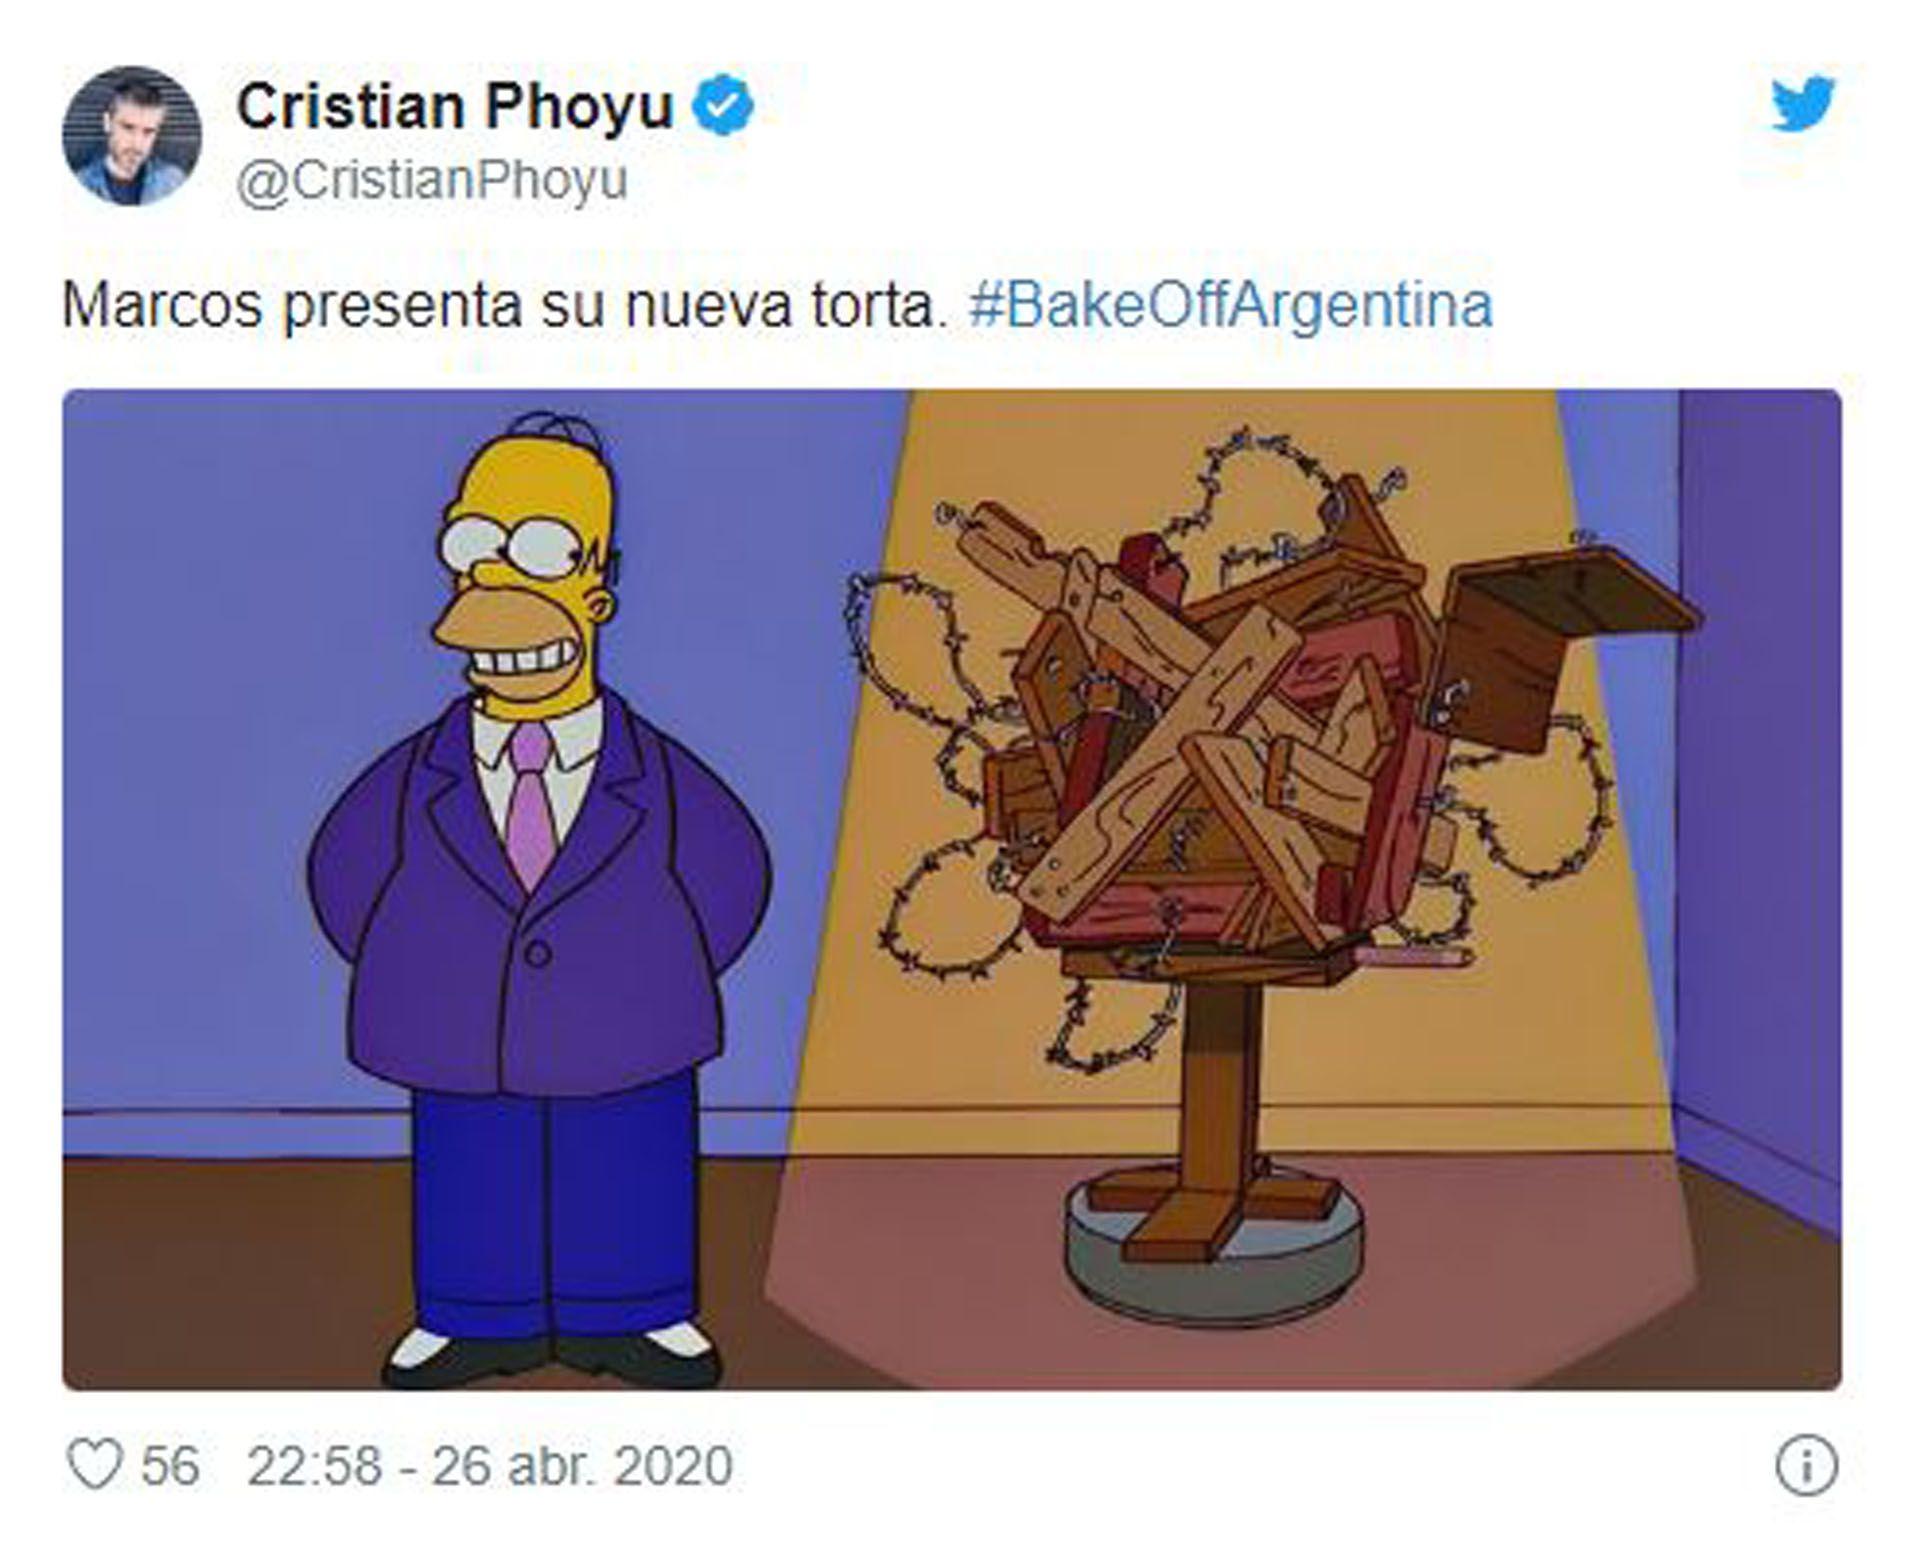 Marcos quedó finalmente eliminado de Bake Off Argentina (Foto: Twitter)